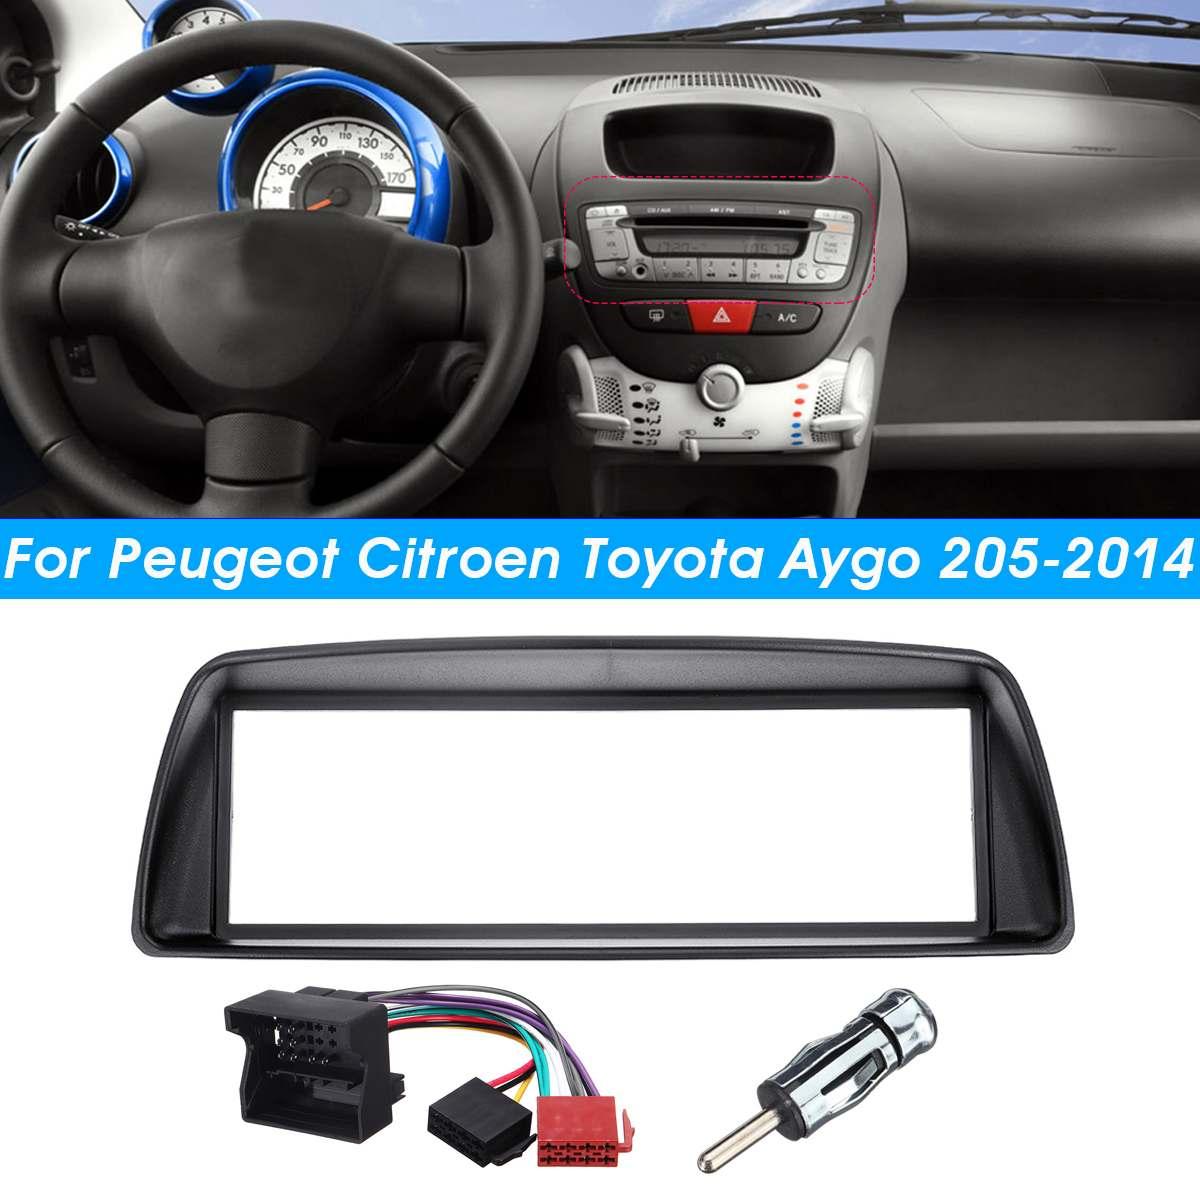 Toyota Aygo Car Panel Plate Fascia Facia Surround Adaptor Car Stereo Fitting Kit